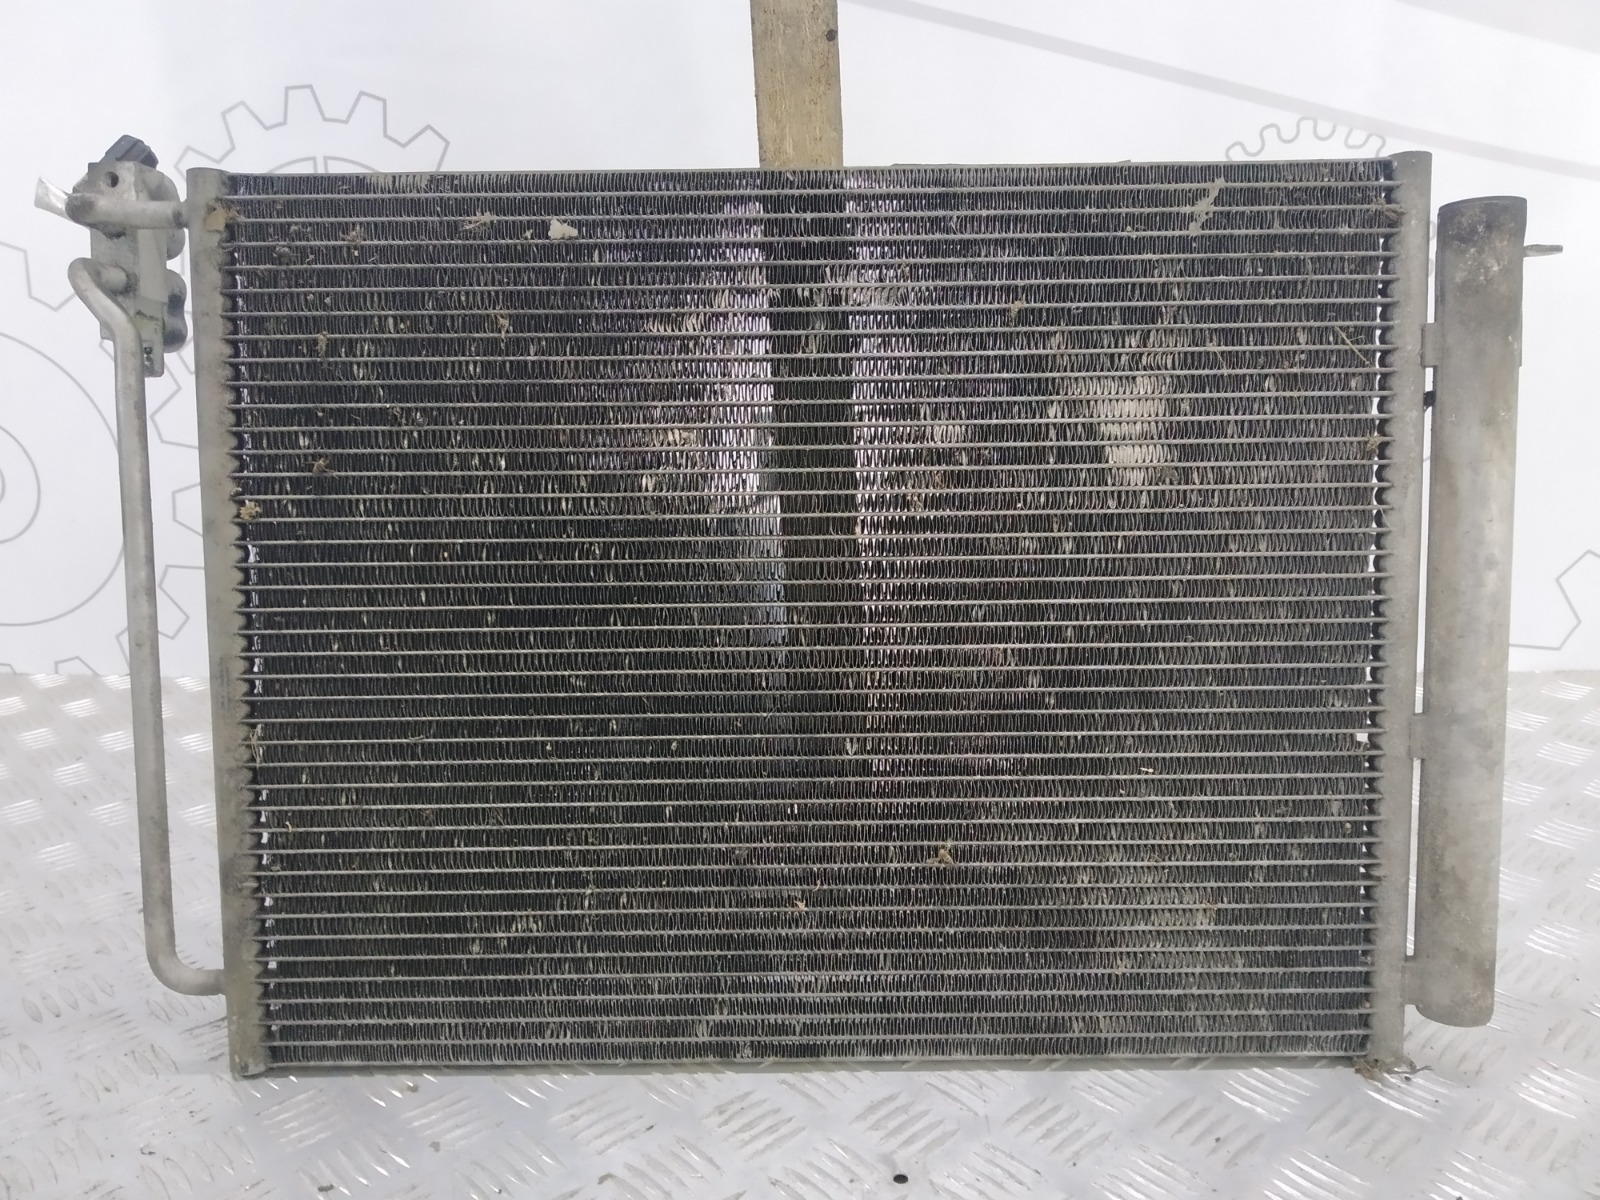 Радиатор кондиционера Bmw X5 E53 4.8 I 2005 (б/у)